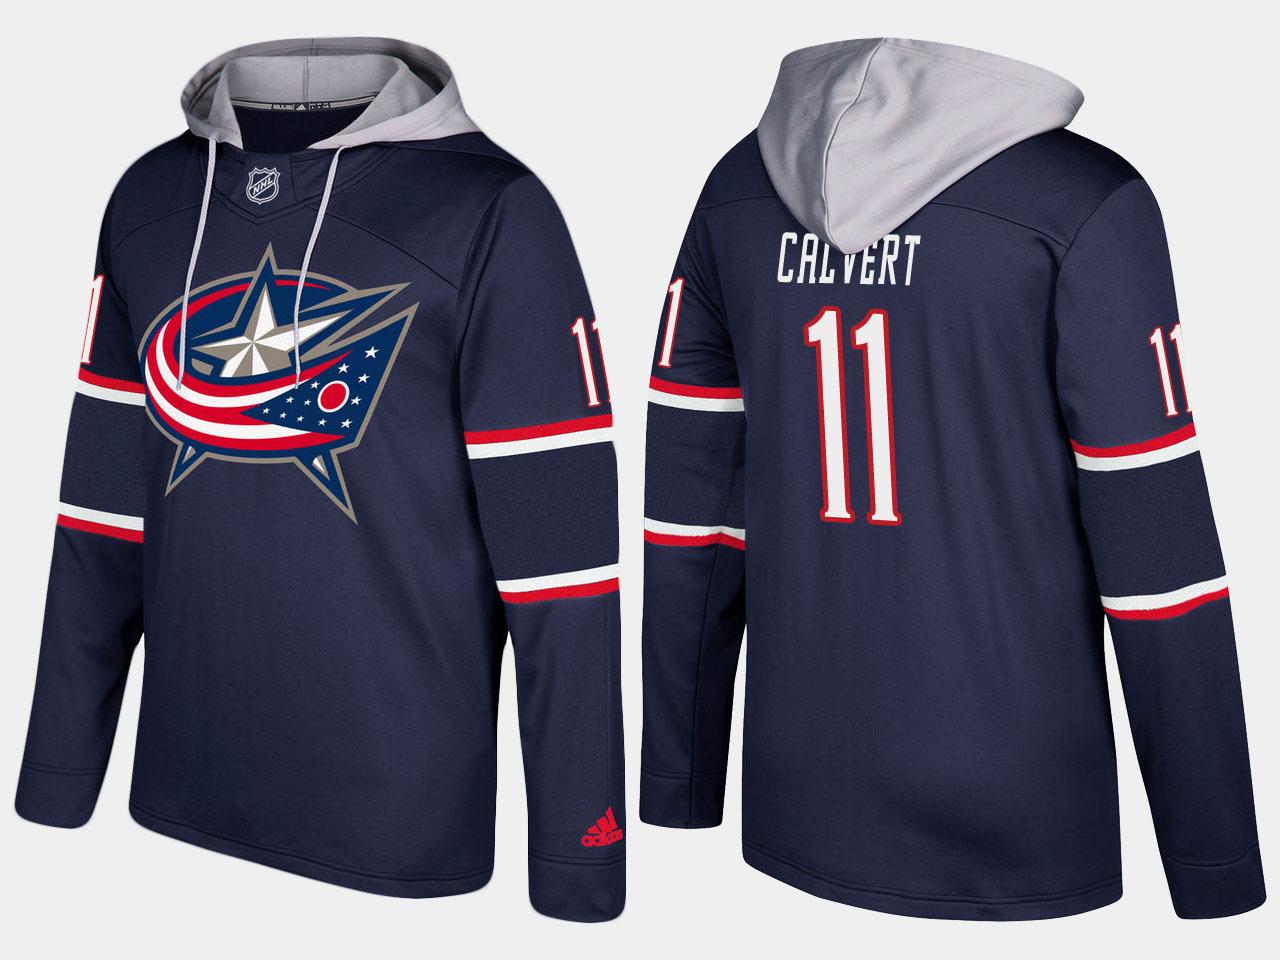 Nike Blue Jackets 11 Matt Calvert Name And Number Navy Hoodie